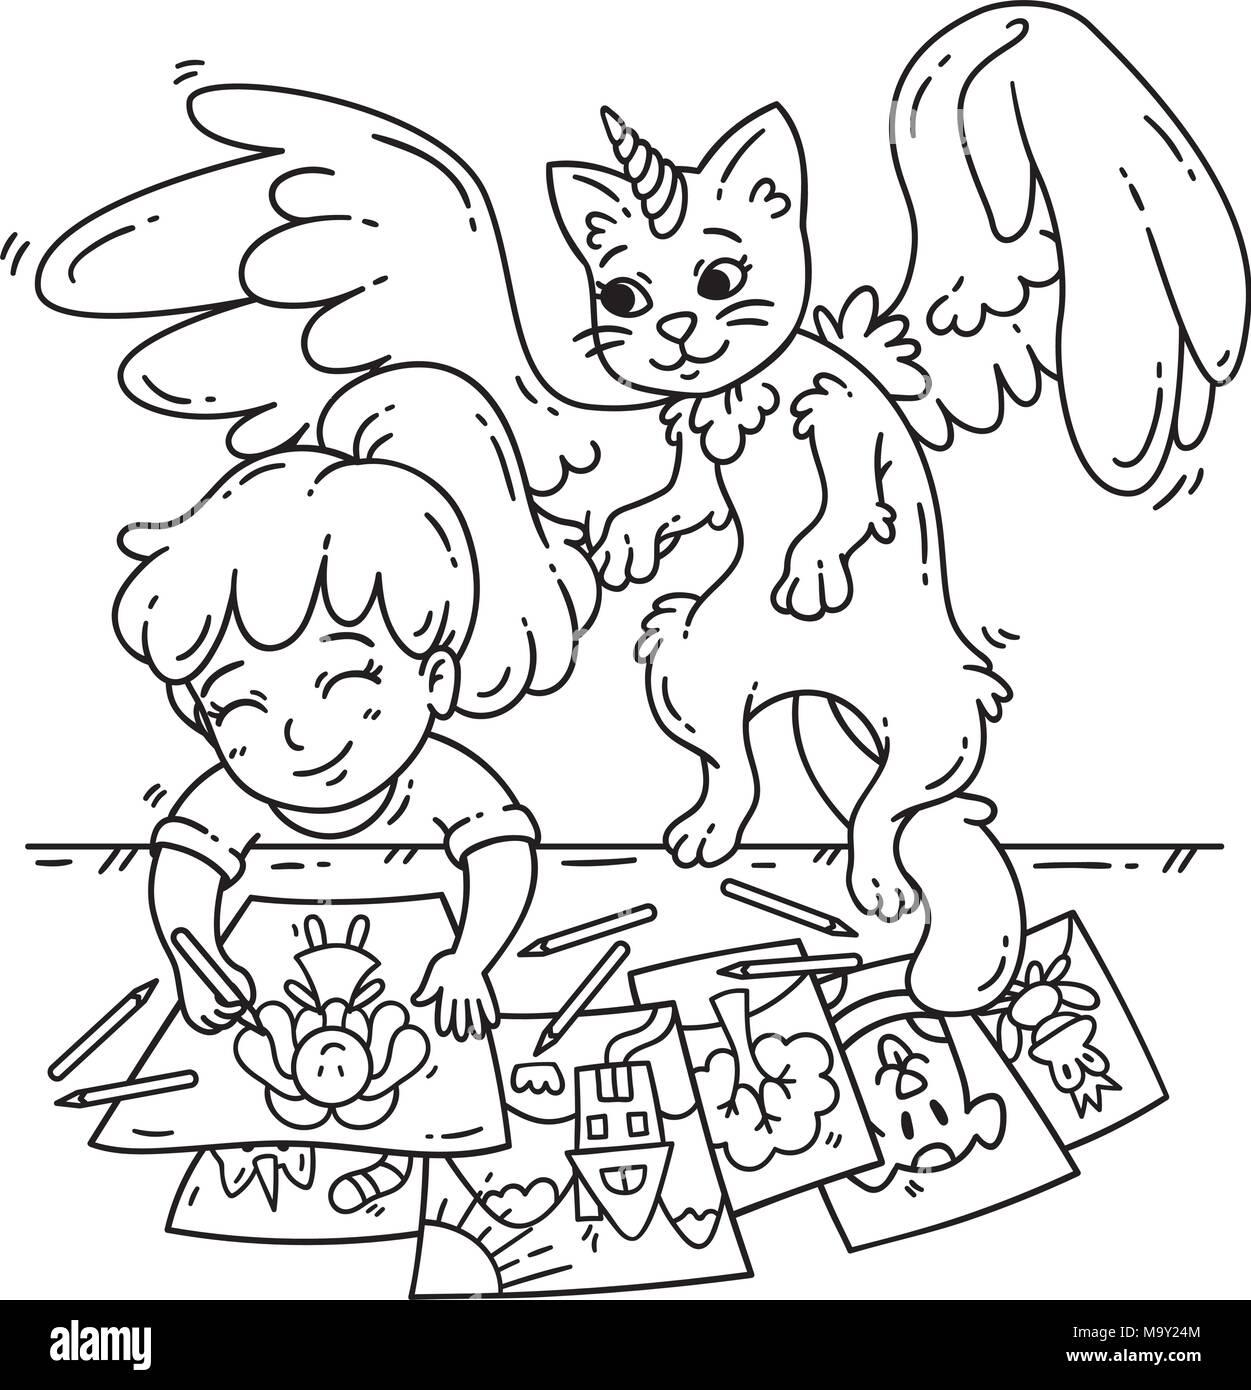 Único Monstruos Altos Para Colorear Embellecimiento - Dibujos Para ...